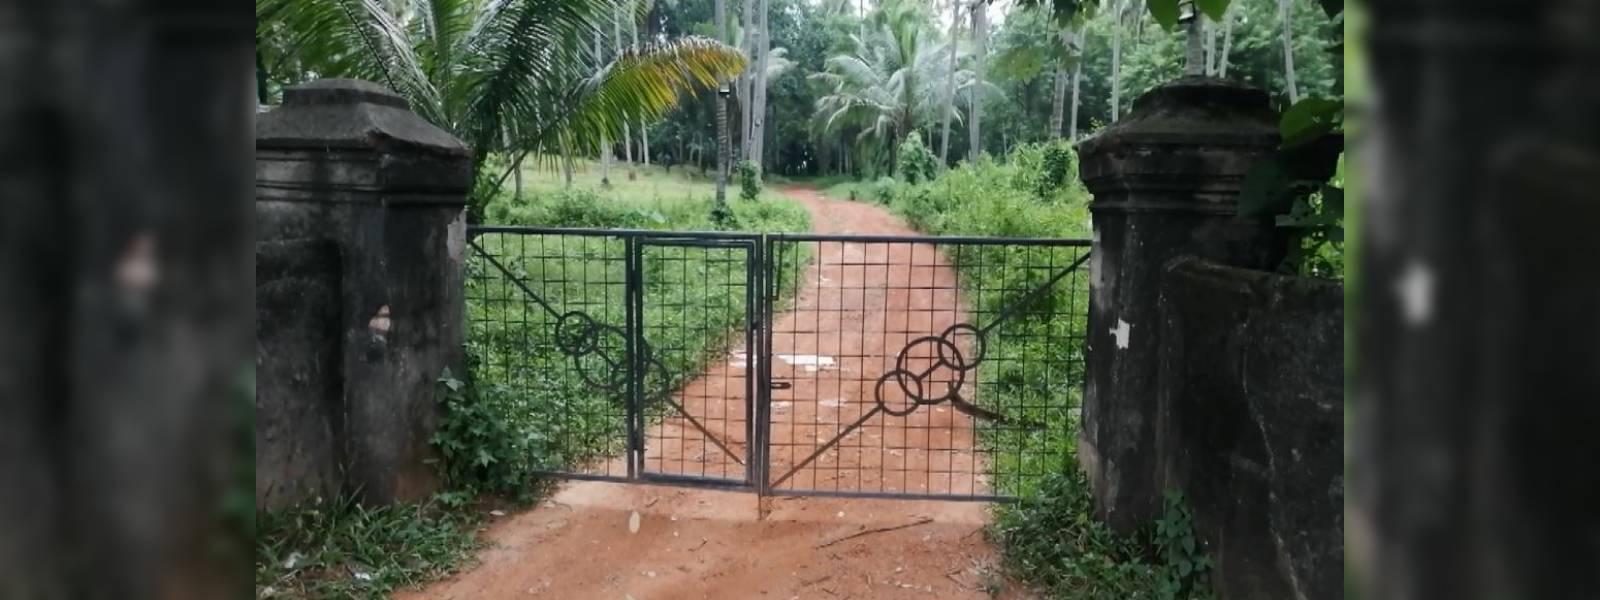 Mystery behind land dispute in Nittambuwa